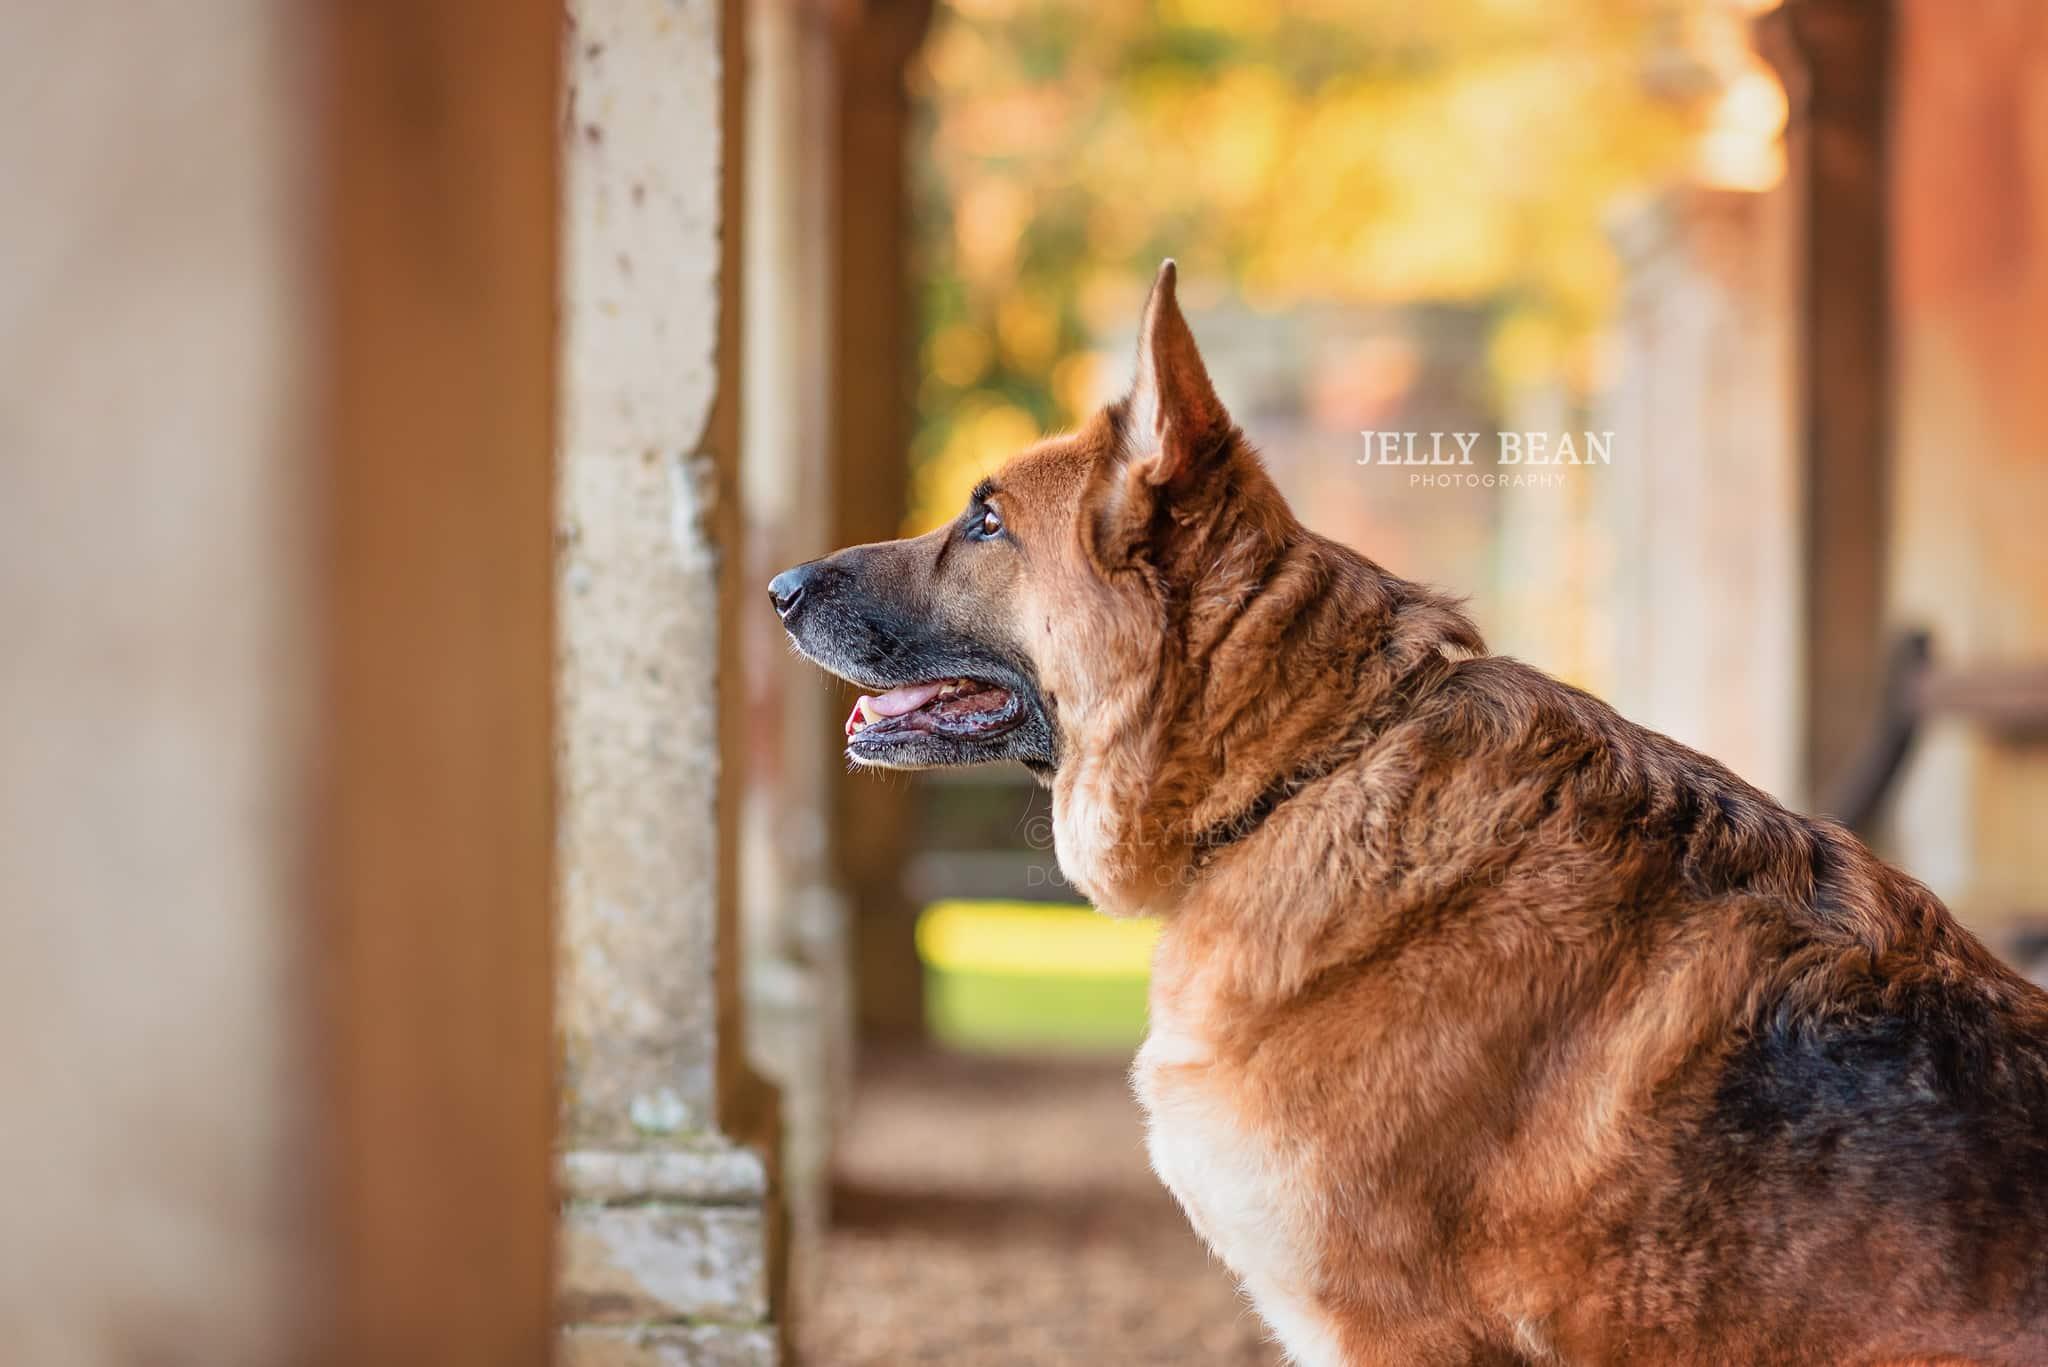 German shepherd profile photograph